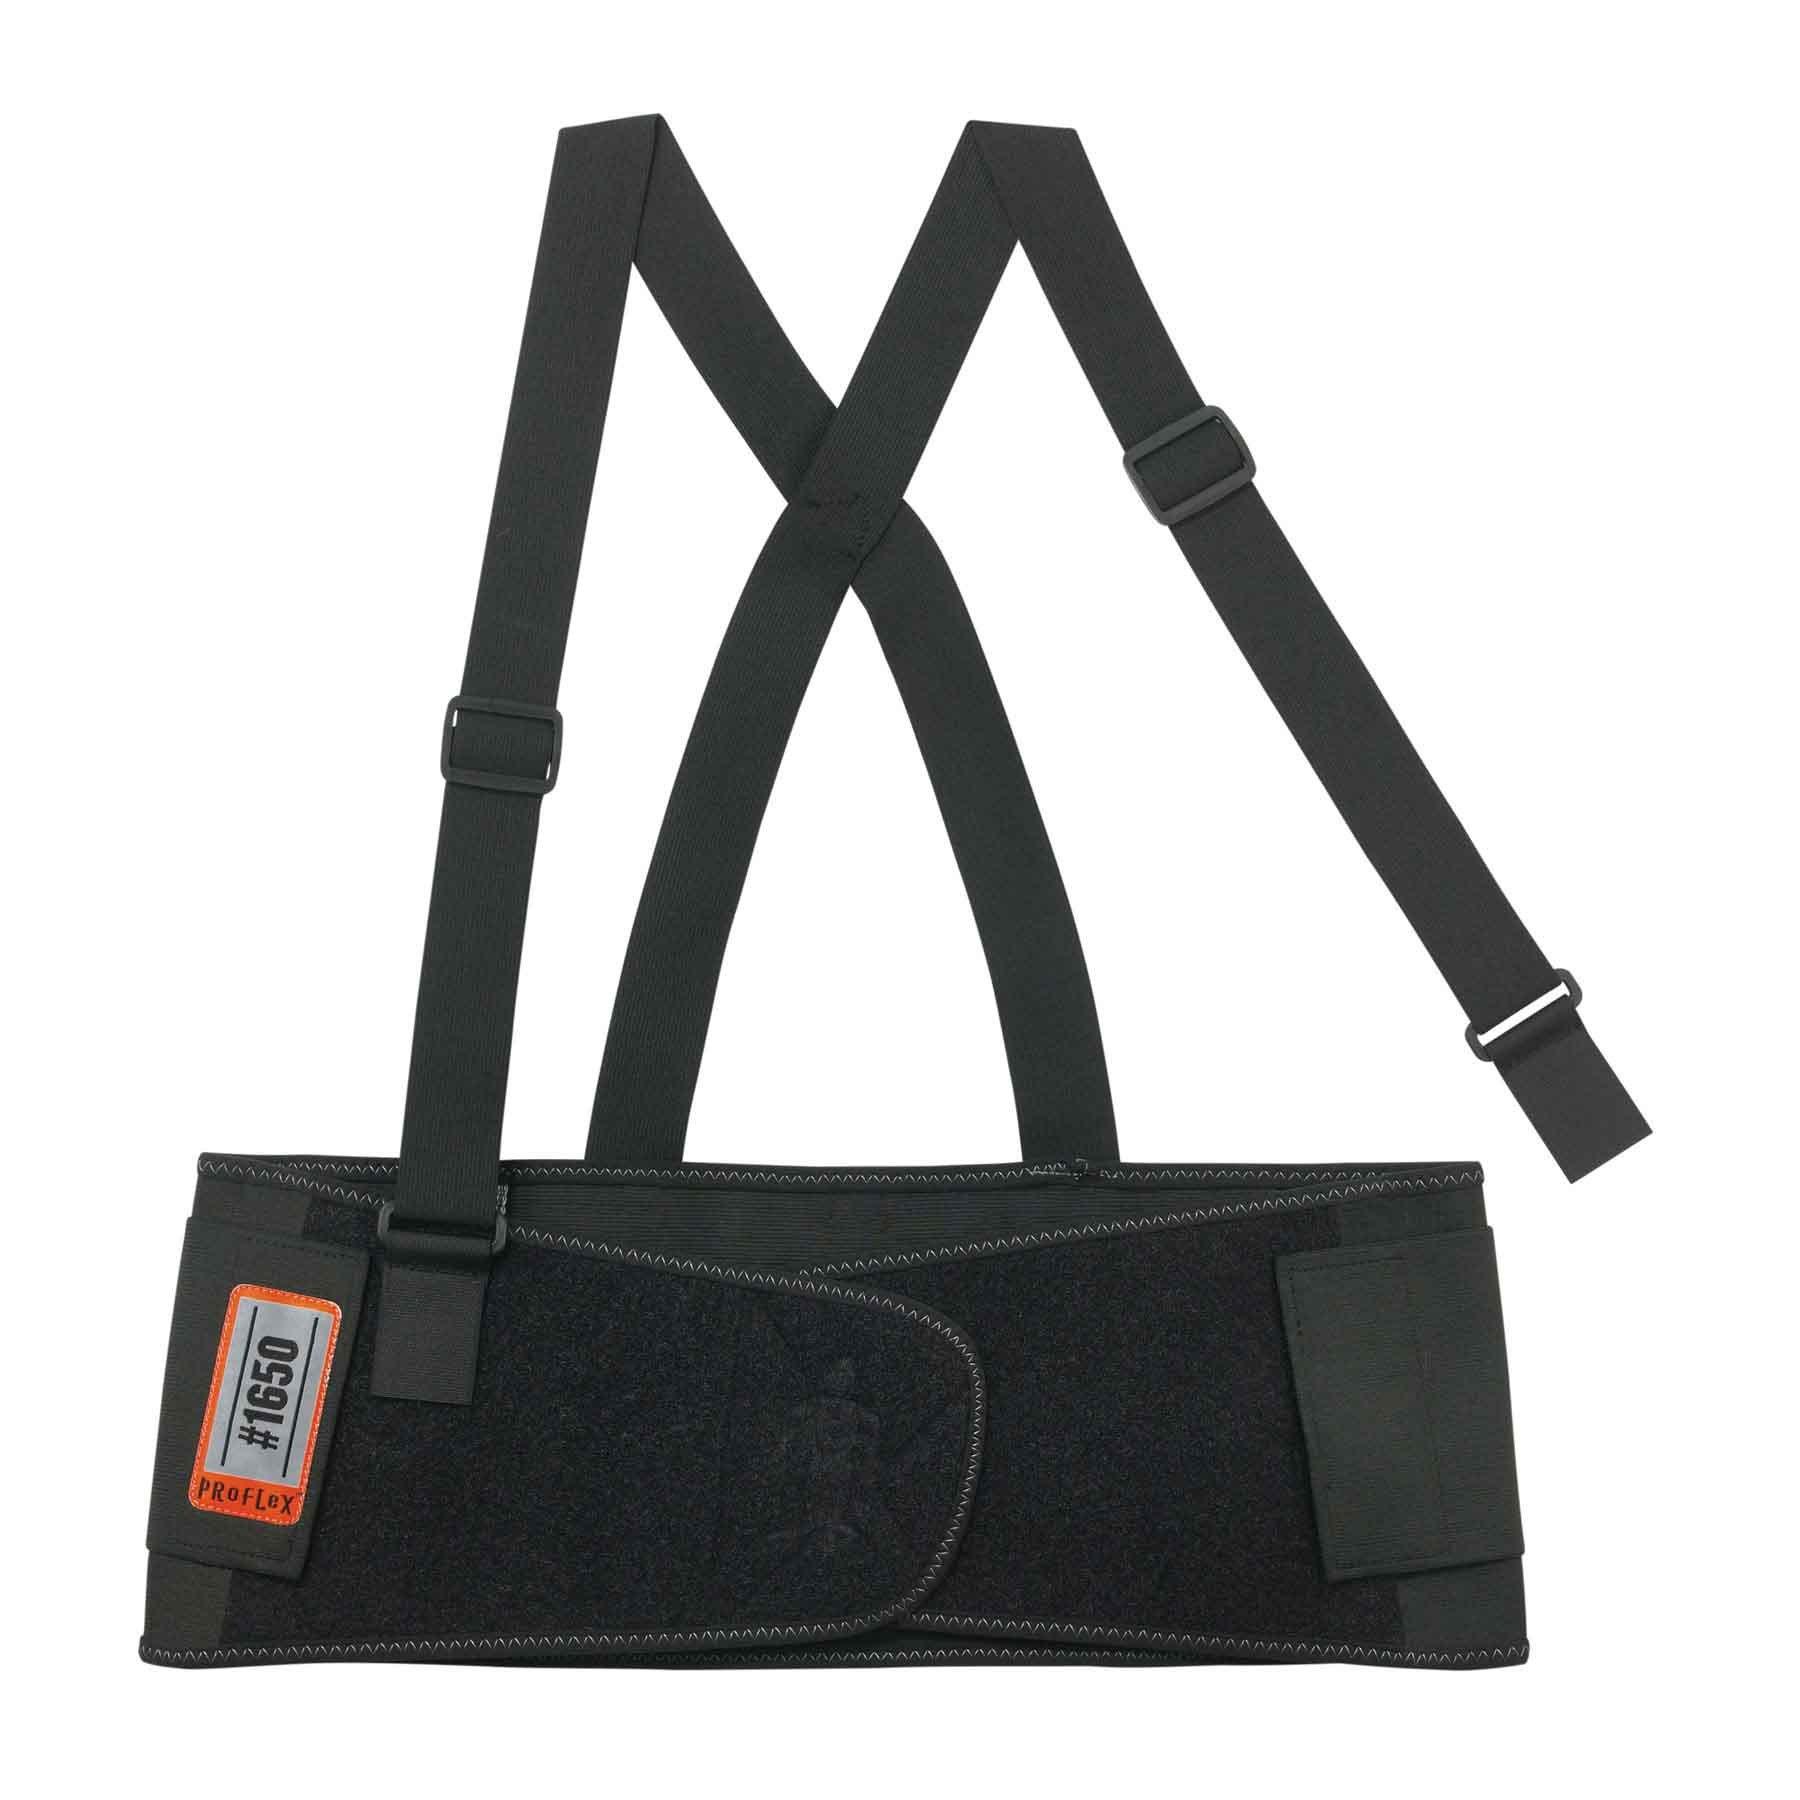 Ergodyne - 1650 S Black Economy Elastic Back Support